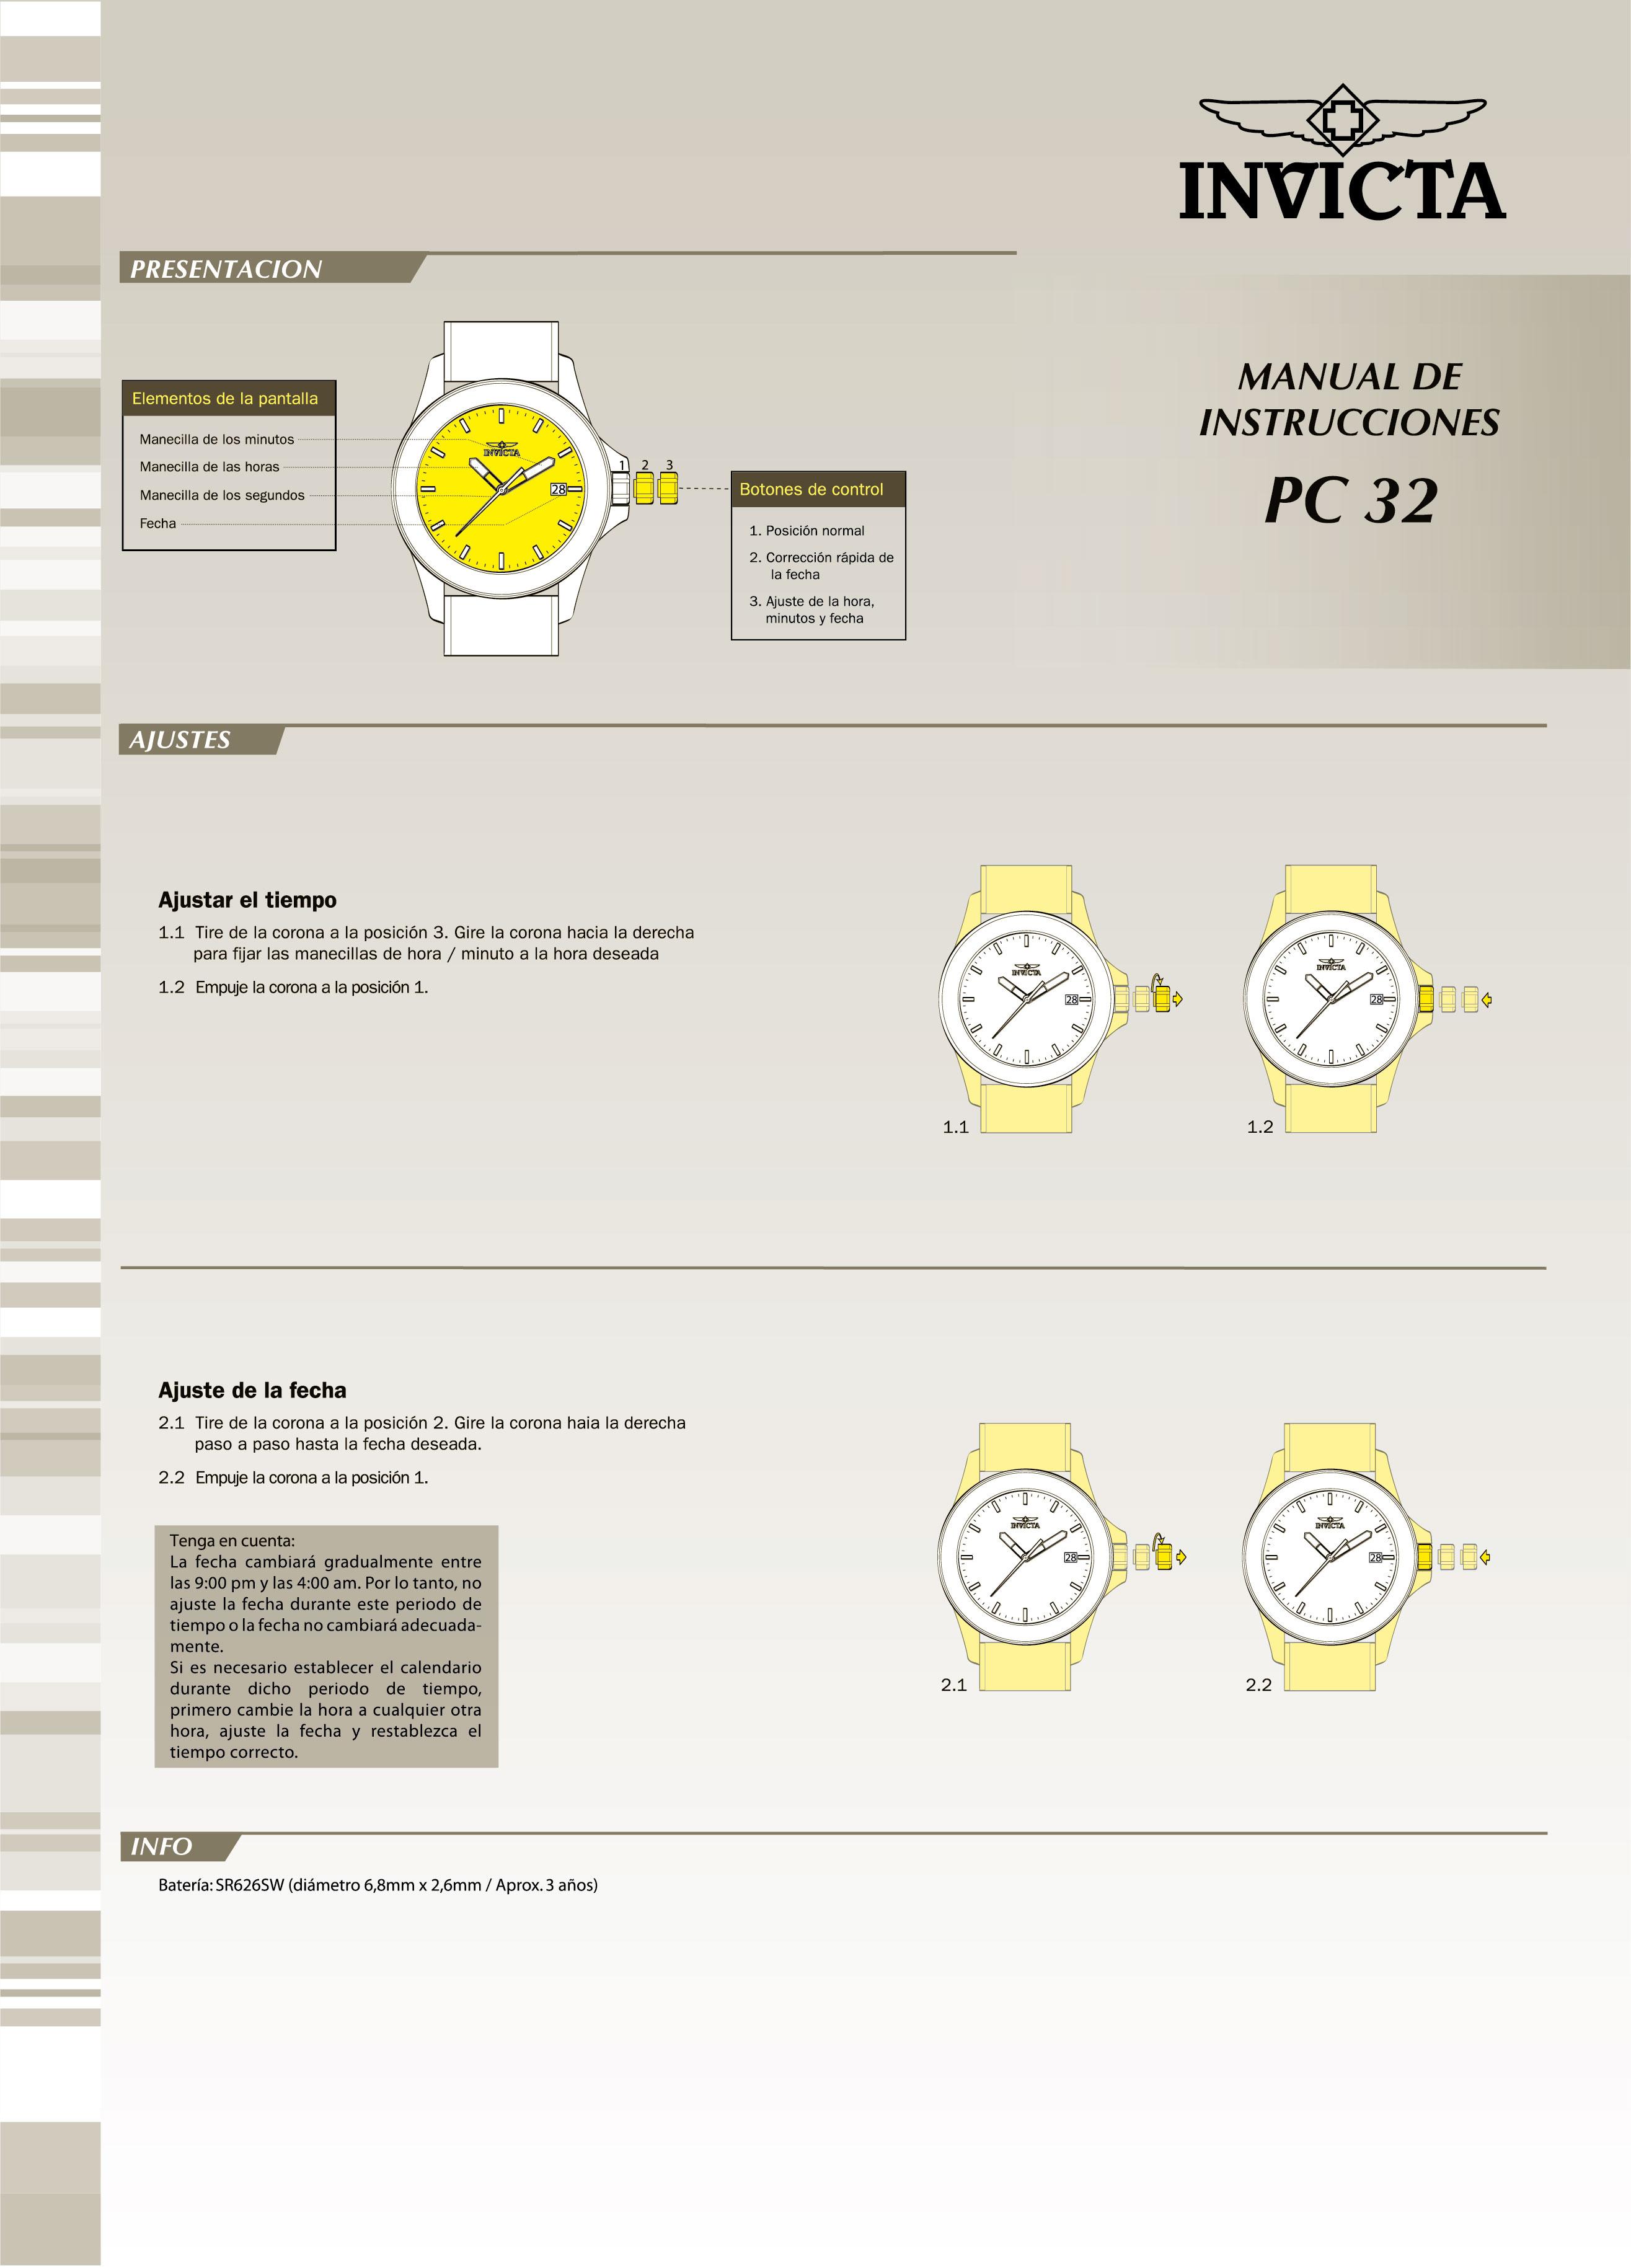 Pc fusion 640t maintenance Manual